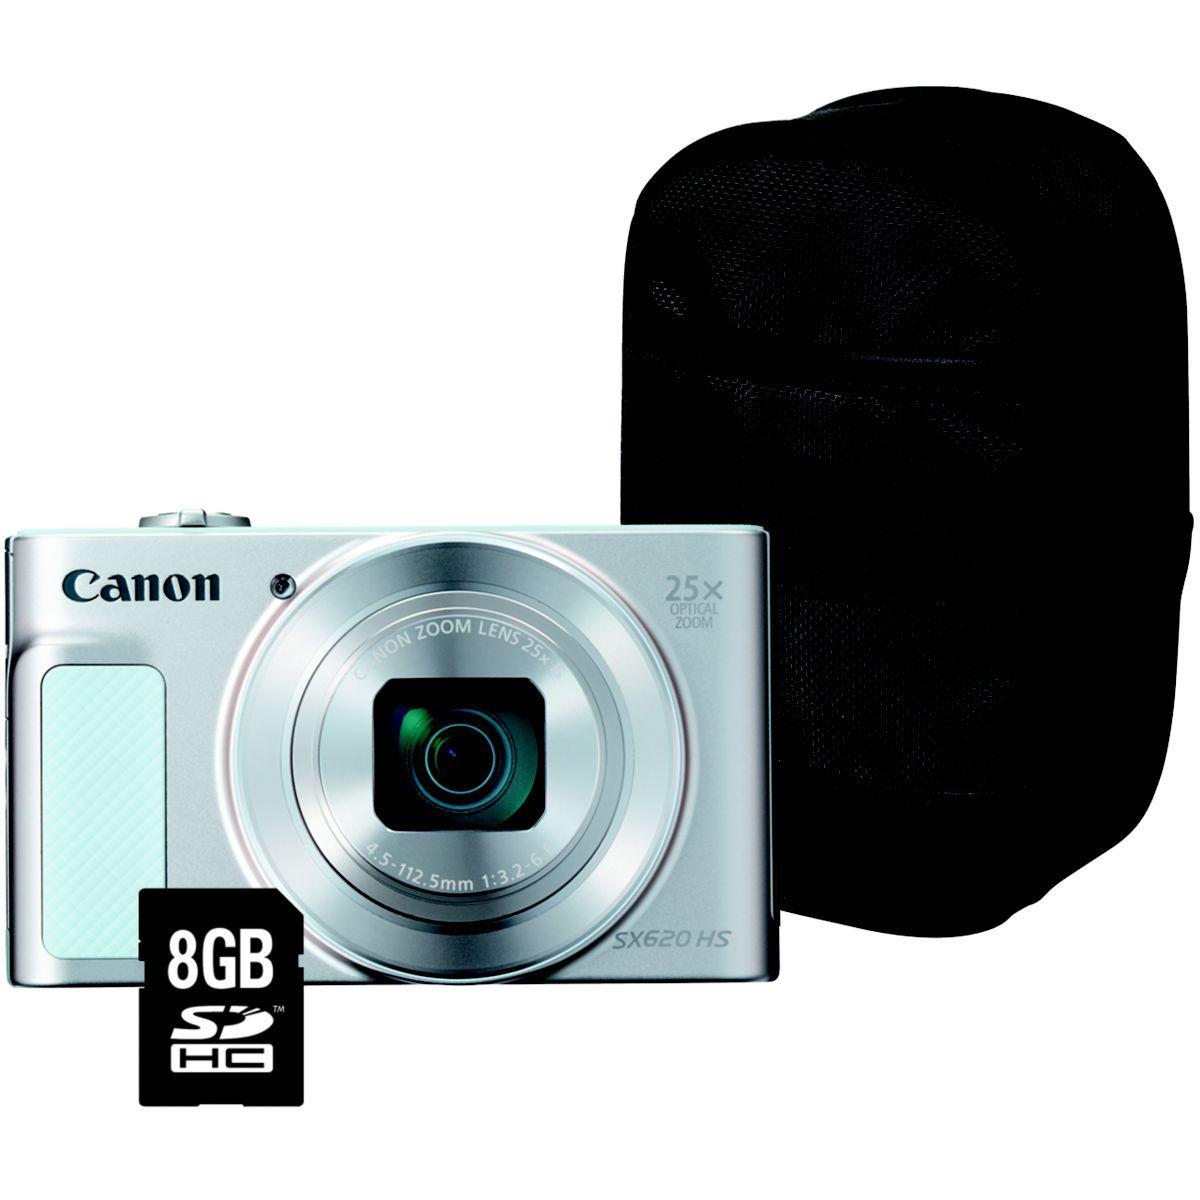 Appareil photo compact canon pack sx620 hs blanc + house + sd 8go - livraison offerte : code livphoto (photo)